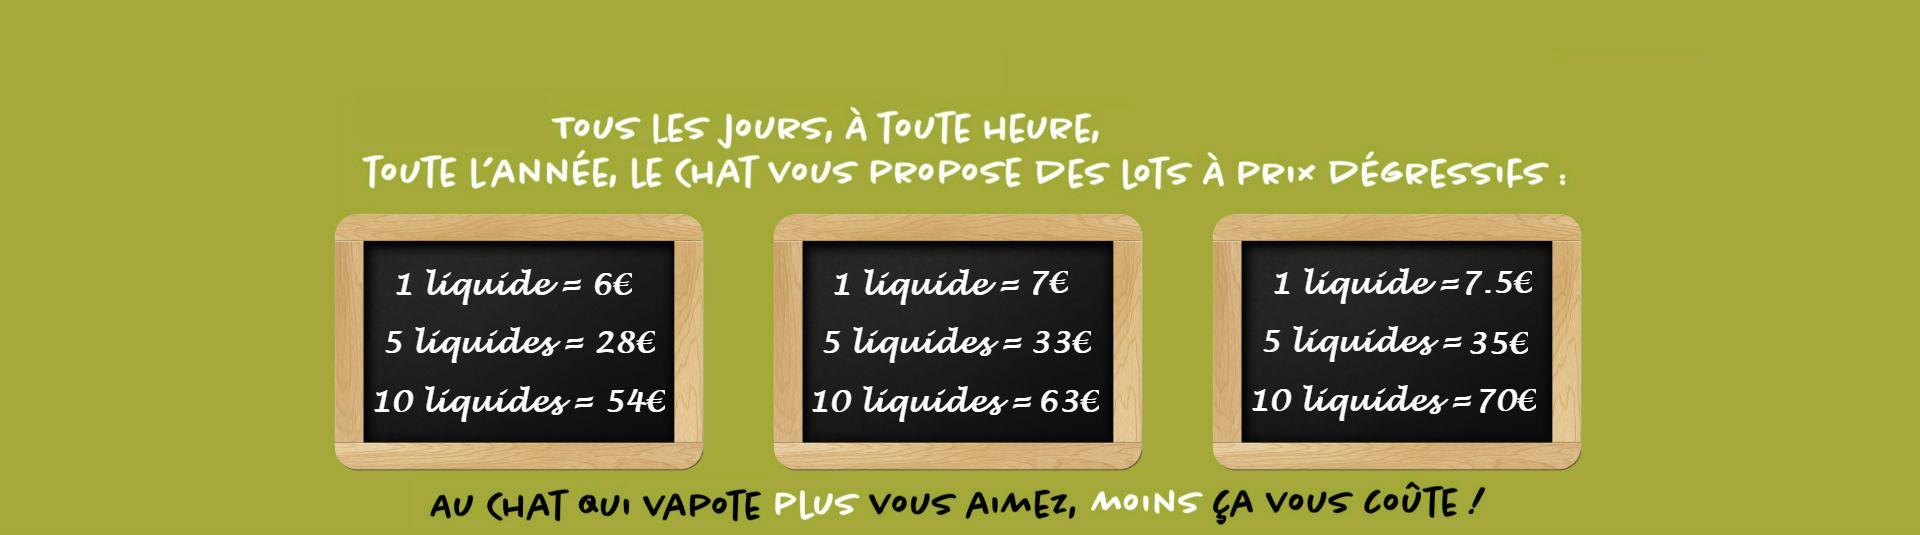 tarifs-liquide-005